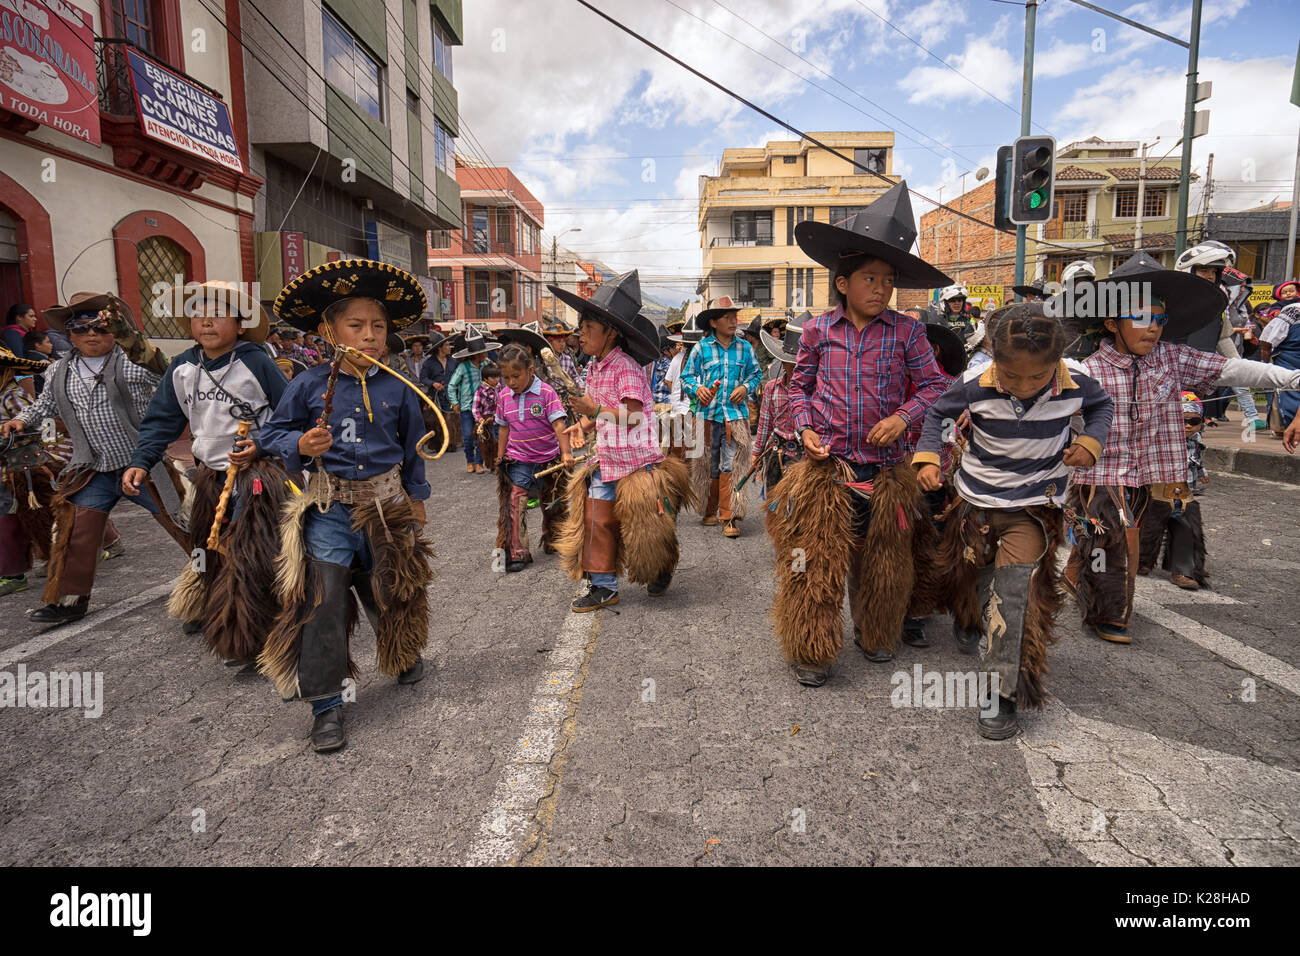 Juni 25, 2017 Cotacachi, Ecuador: Indigene quechua Kinder tragen Sombreros und Chaps tanzen im Inti Raymi feiern Stockbild